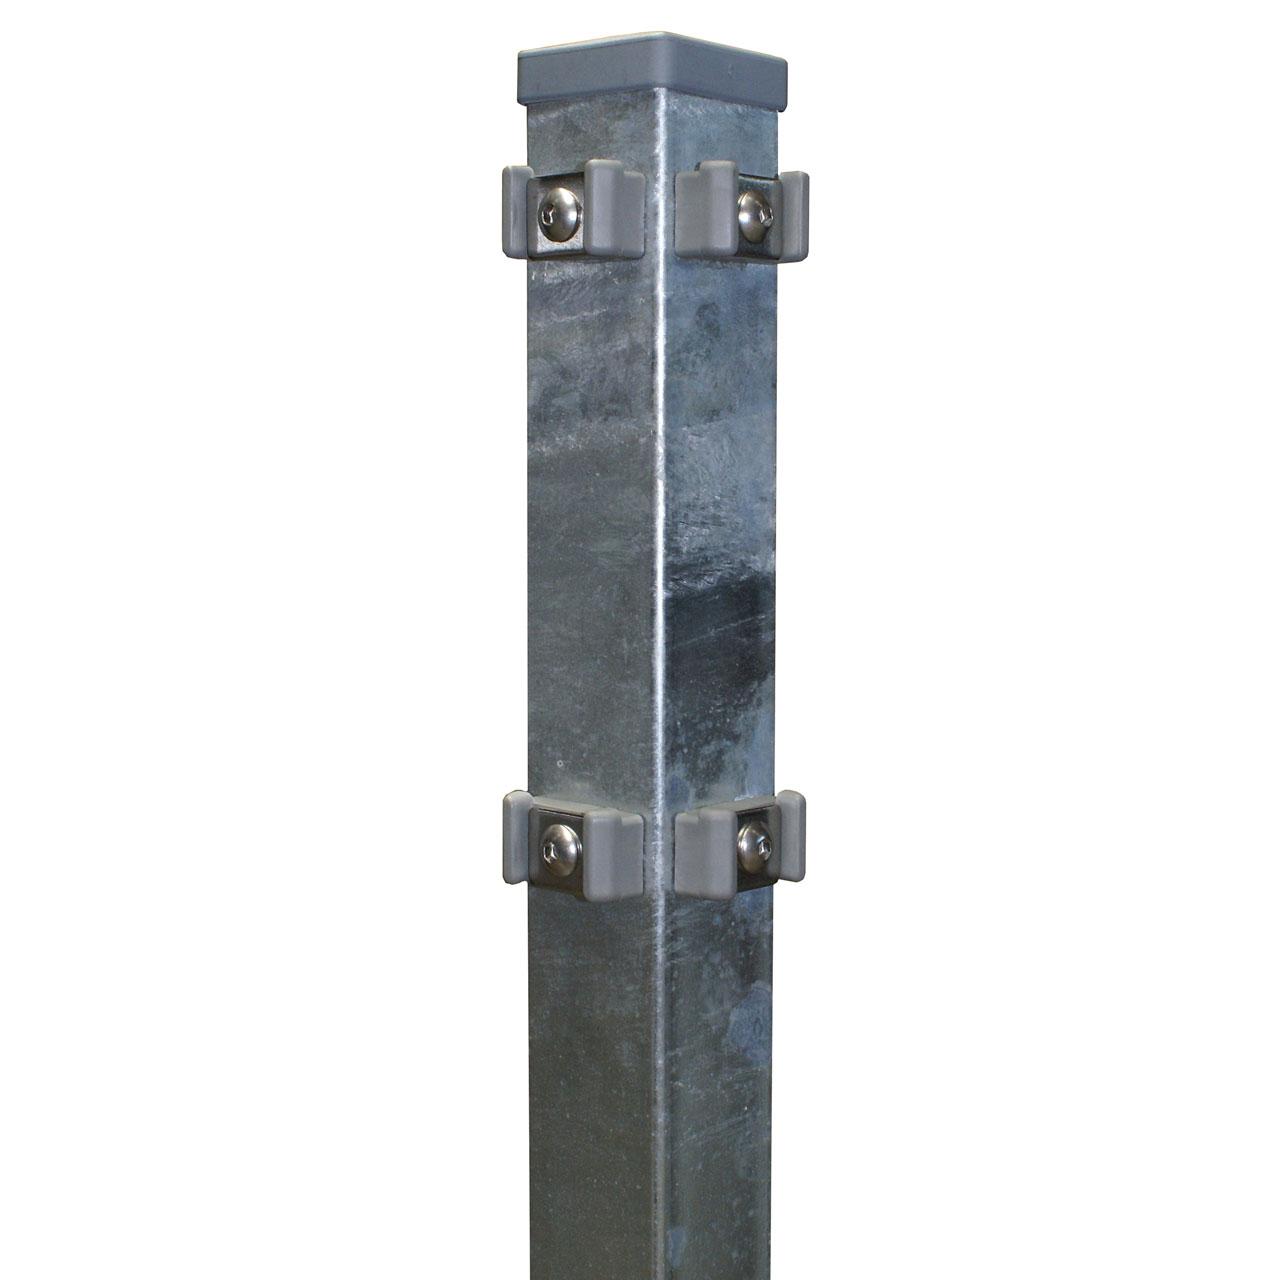 Eckpfosten für Doppelstabmatte 80cm verzinkt